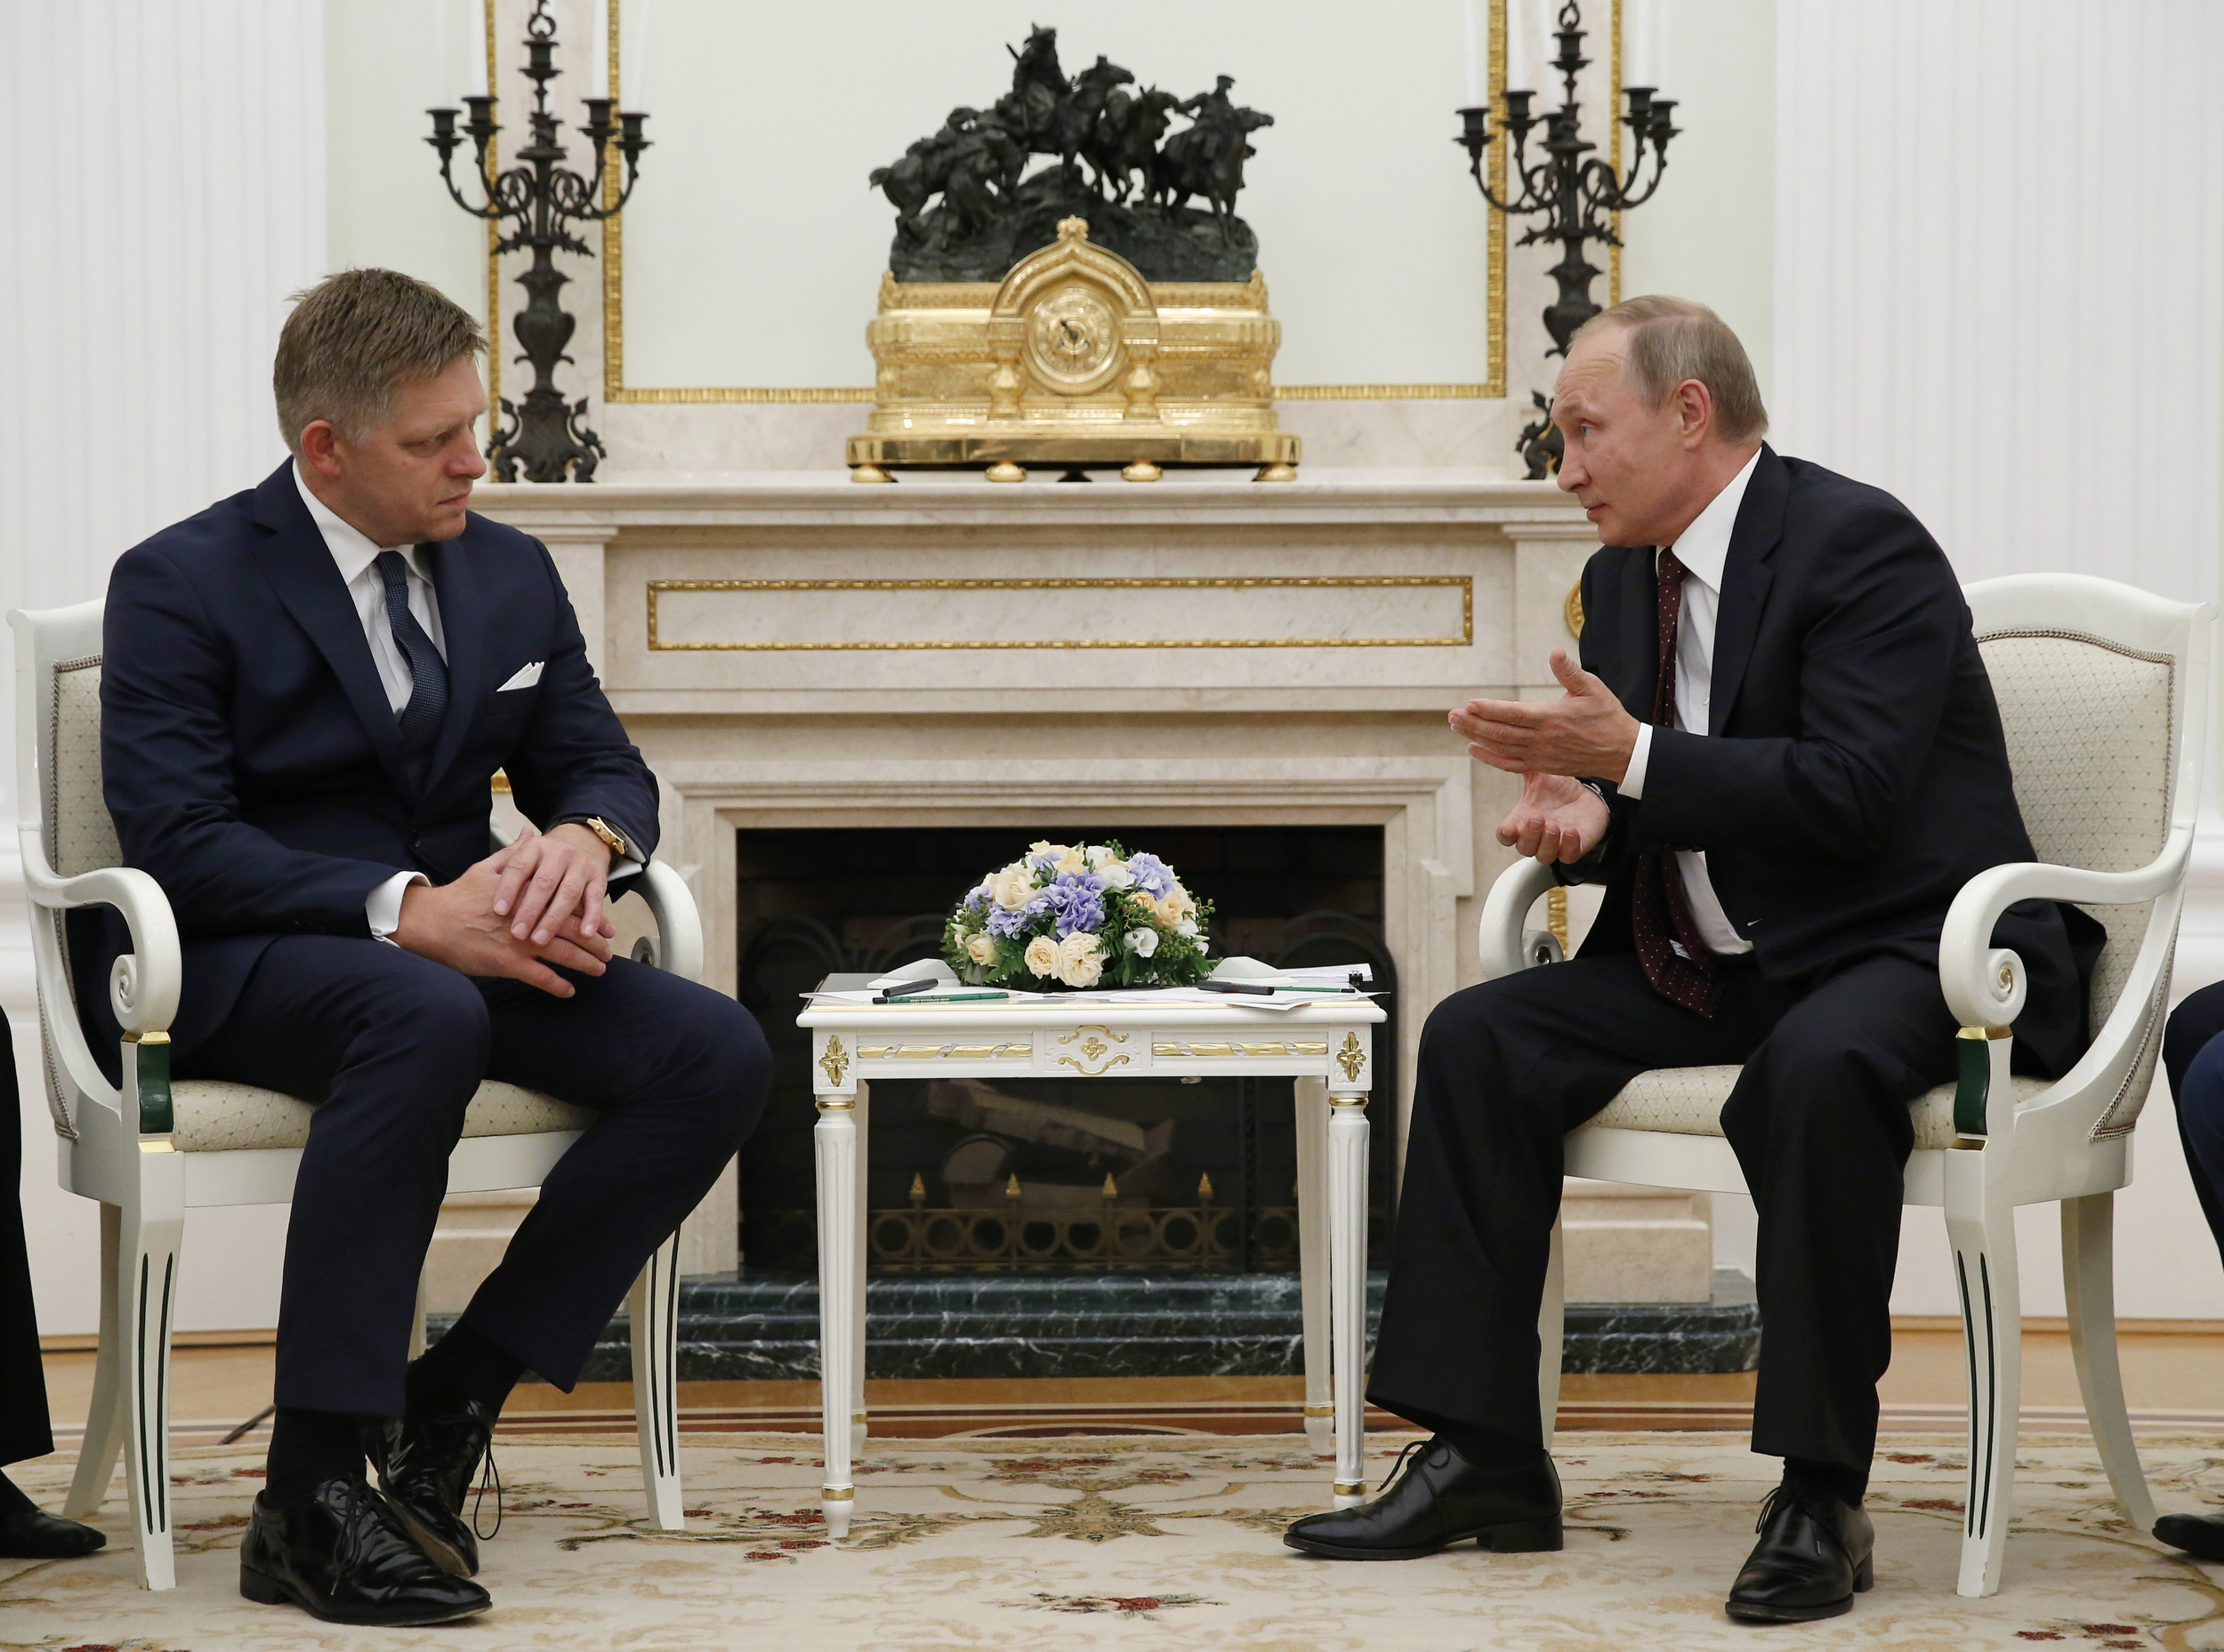 Moskva, Vladimir Putin, Robert Fico